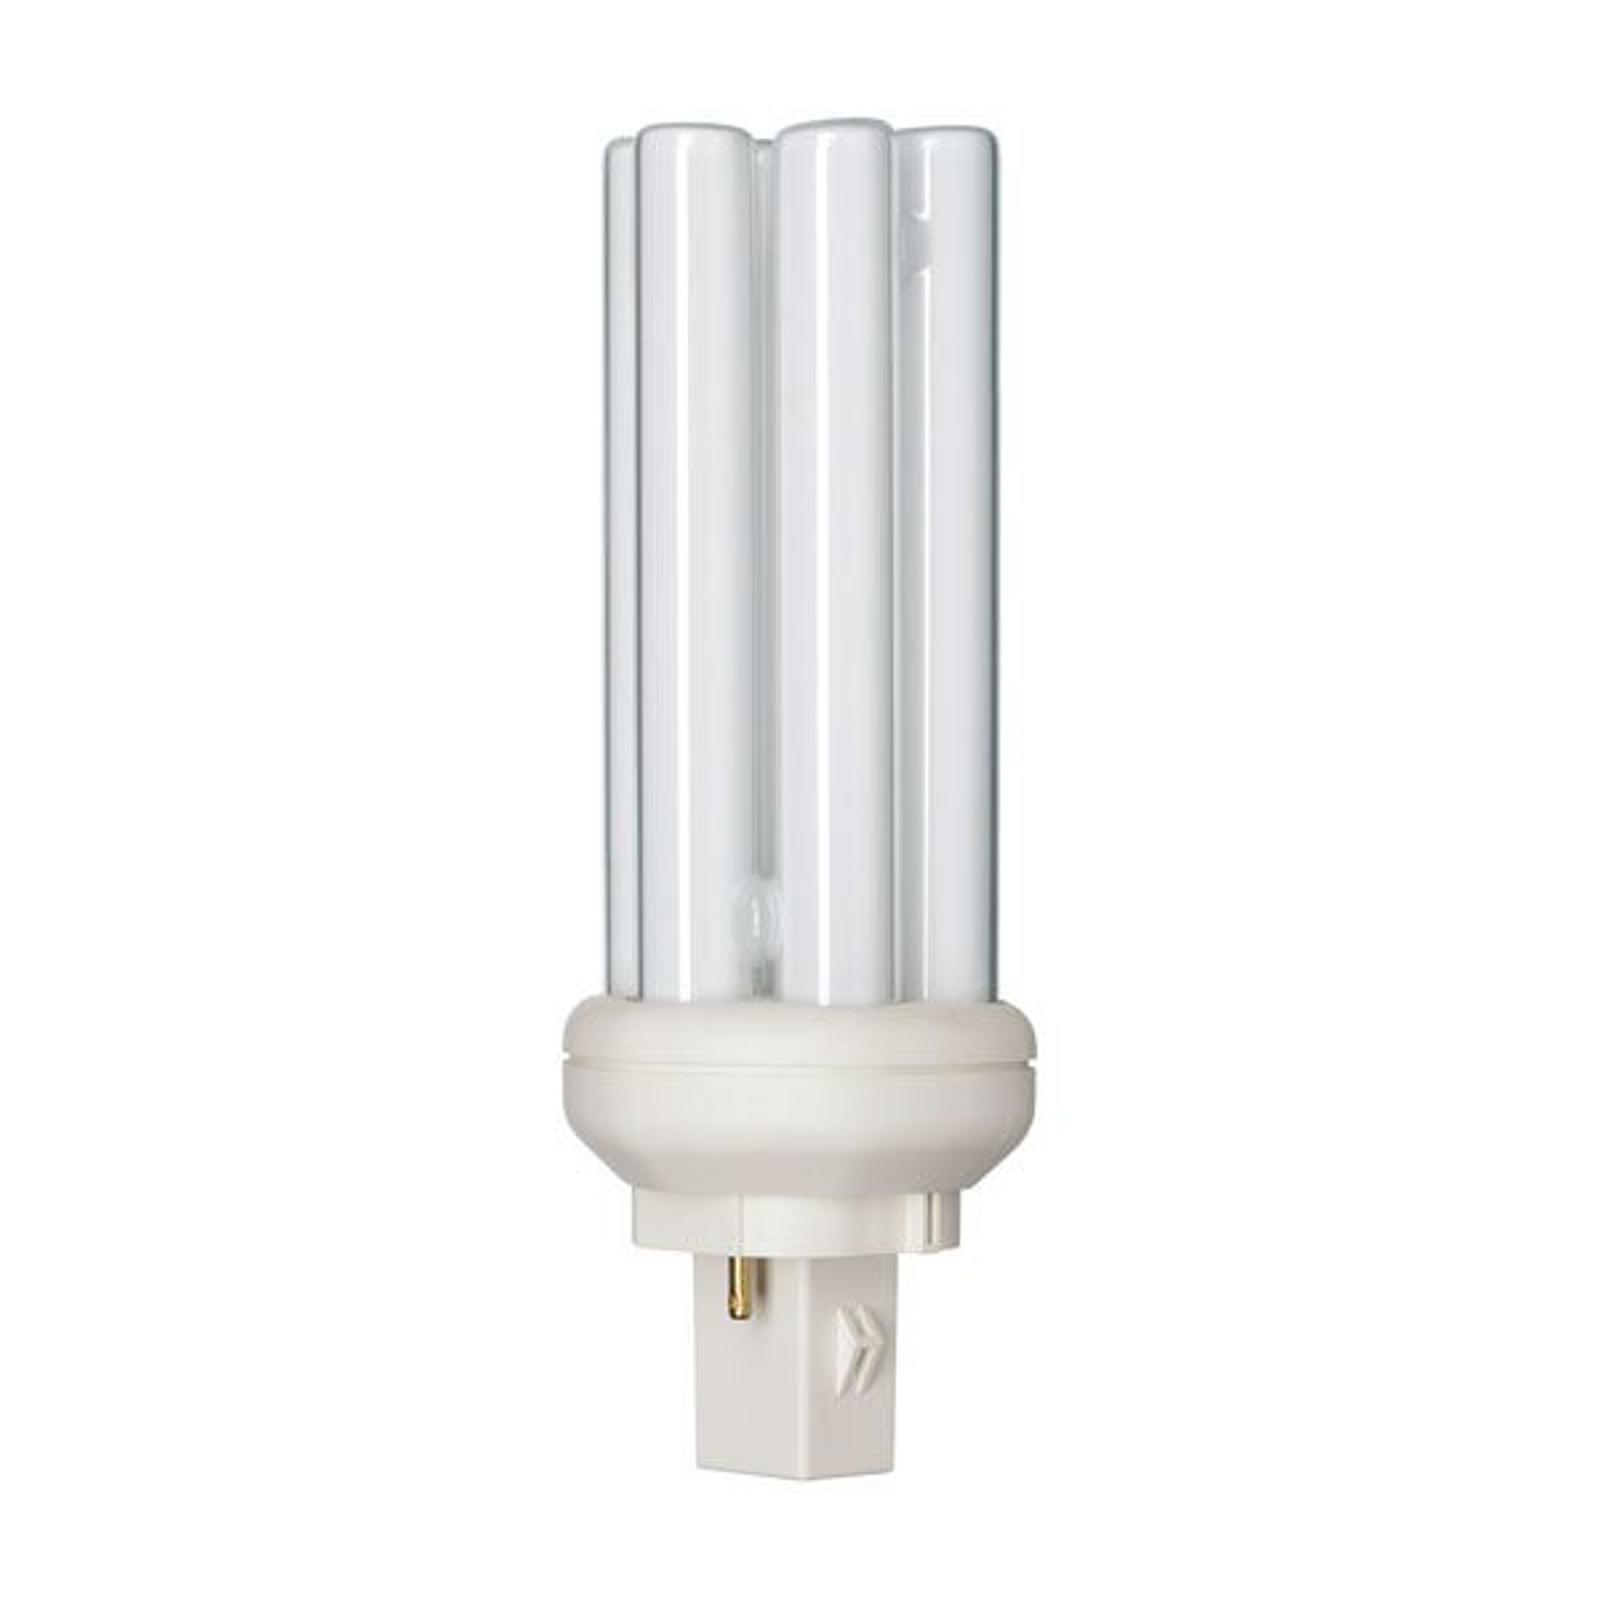 GX24d Kompaktleuchtstofflampe Master 18W PL-T 840